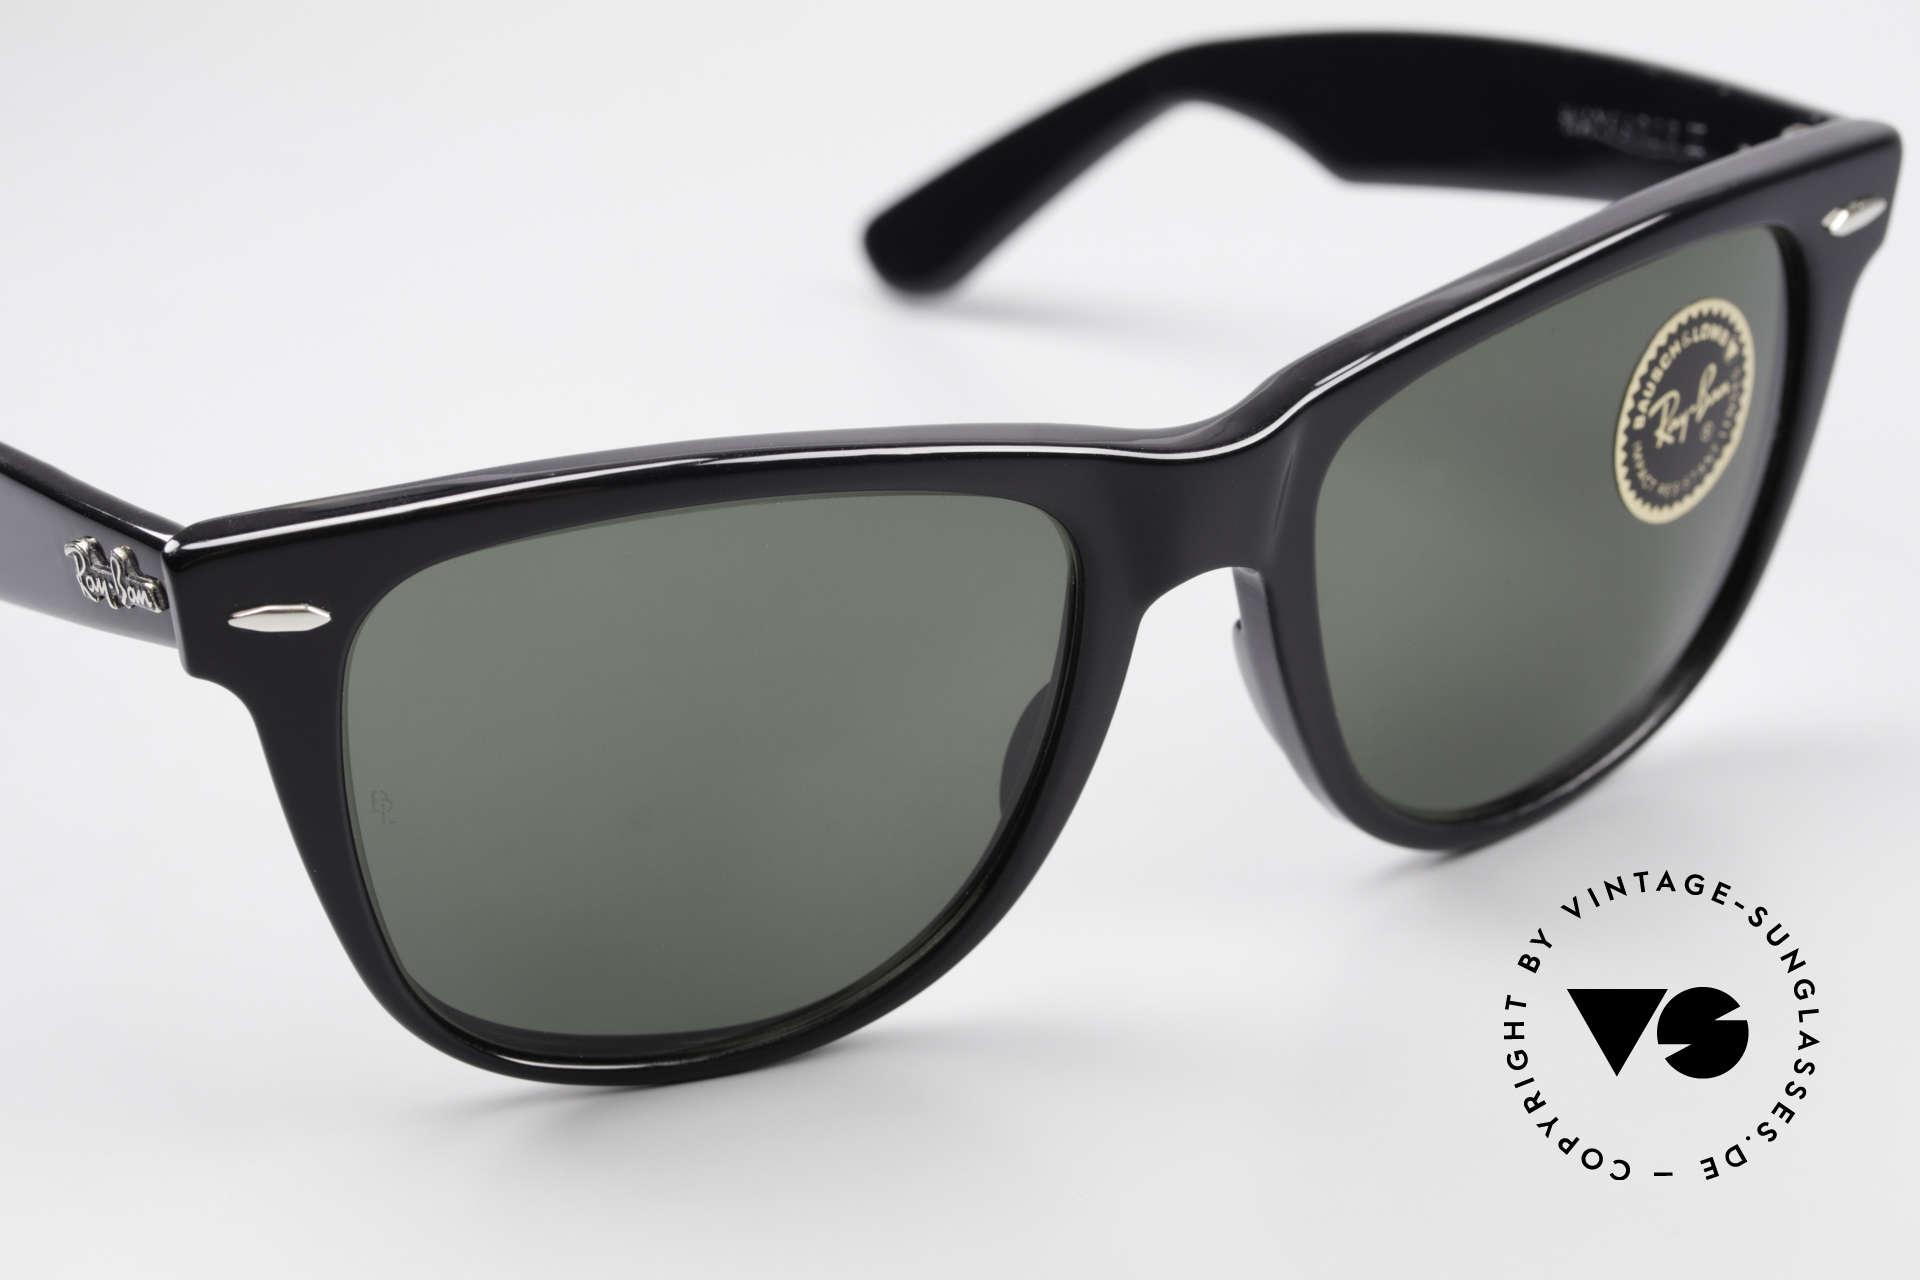 Ray Ban Wayfarer II JFK USA Vintage Sunglasses, ORIGINAL 80's commodity, NO RETRO eyewear!, Made for Men